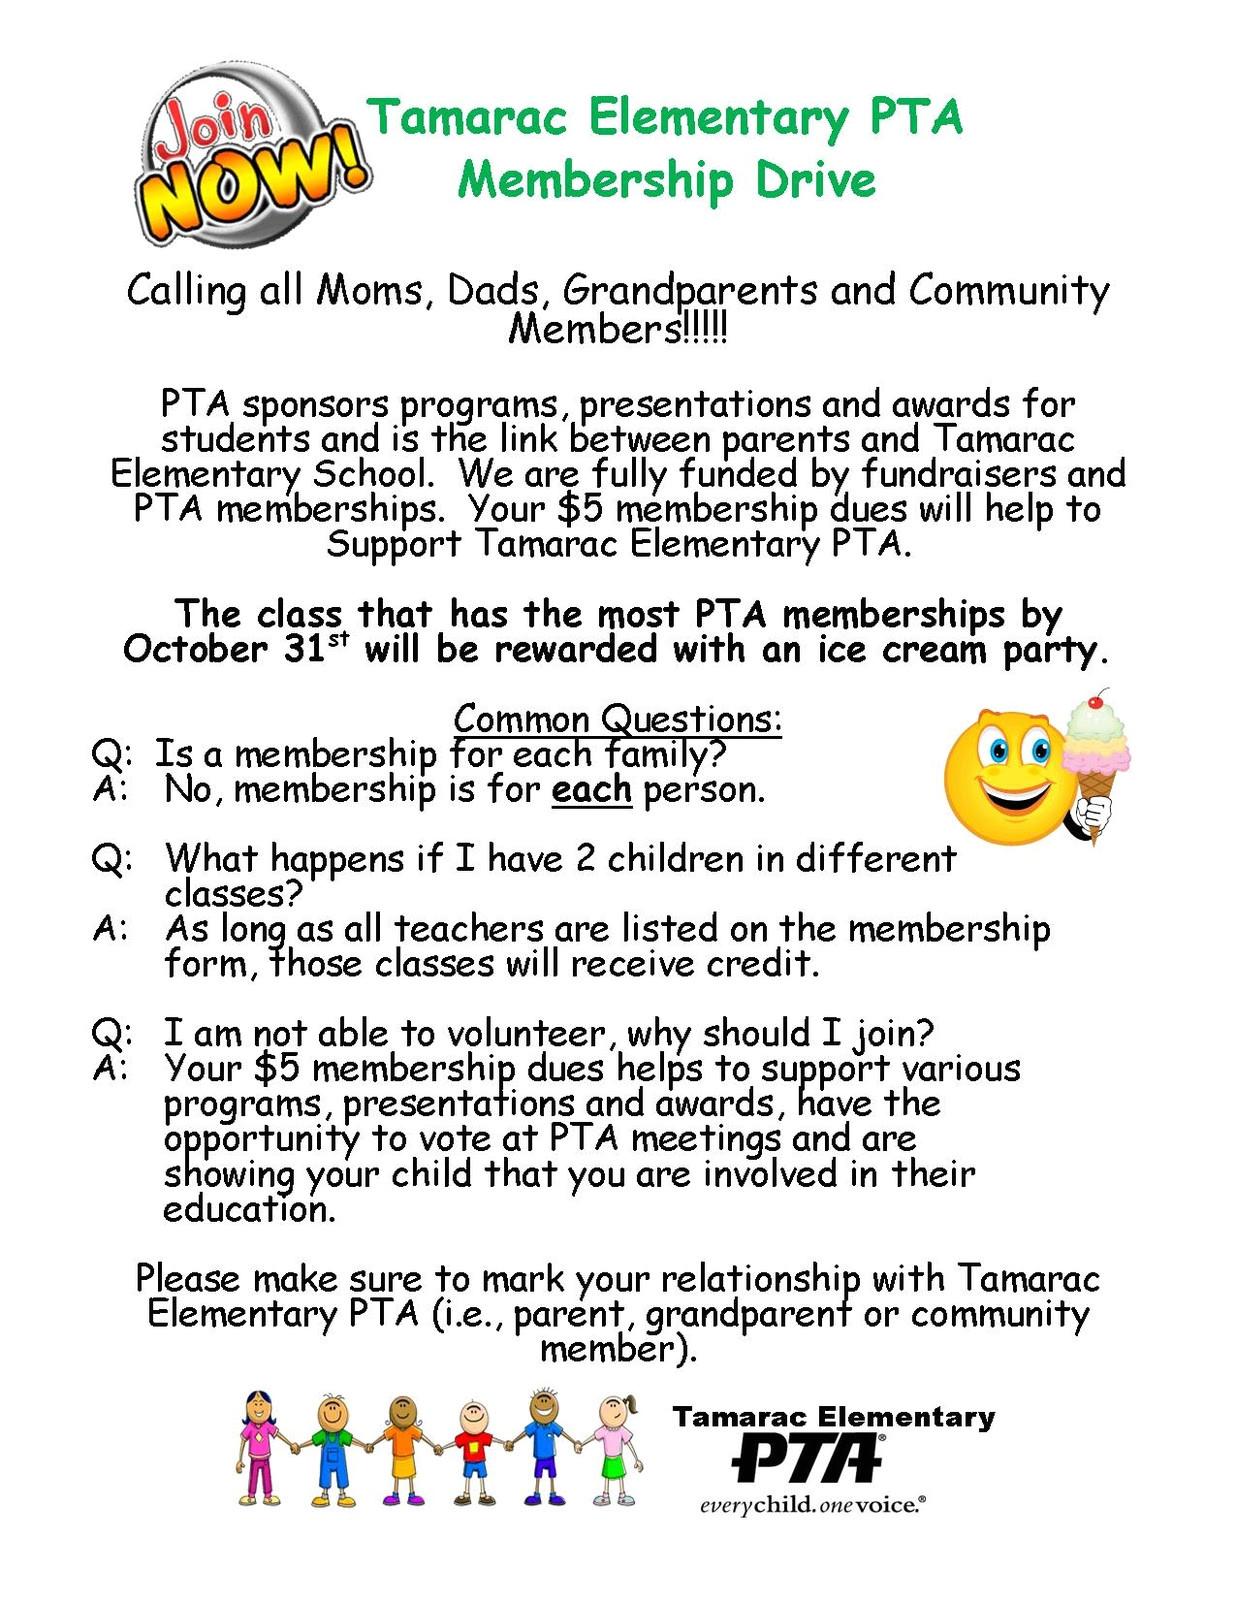 pta membership drive through october